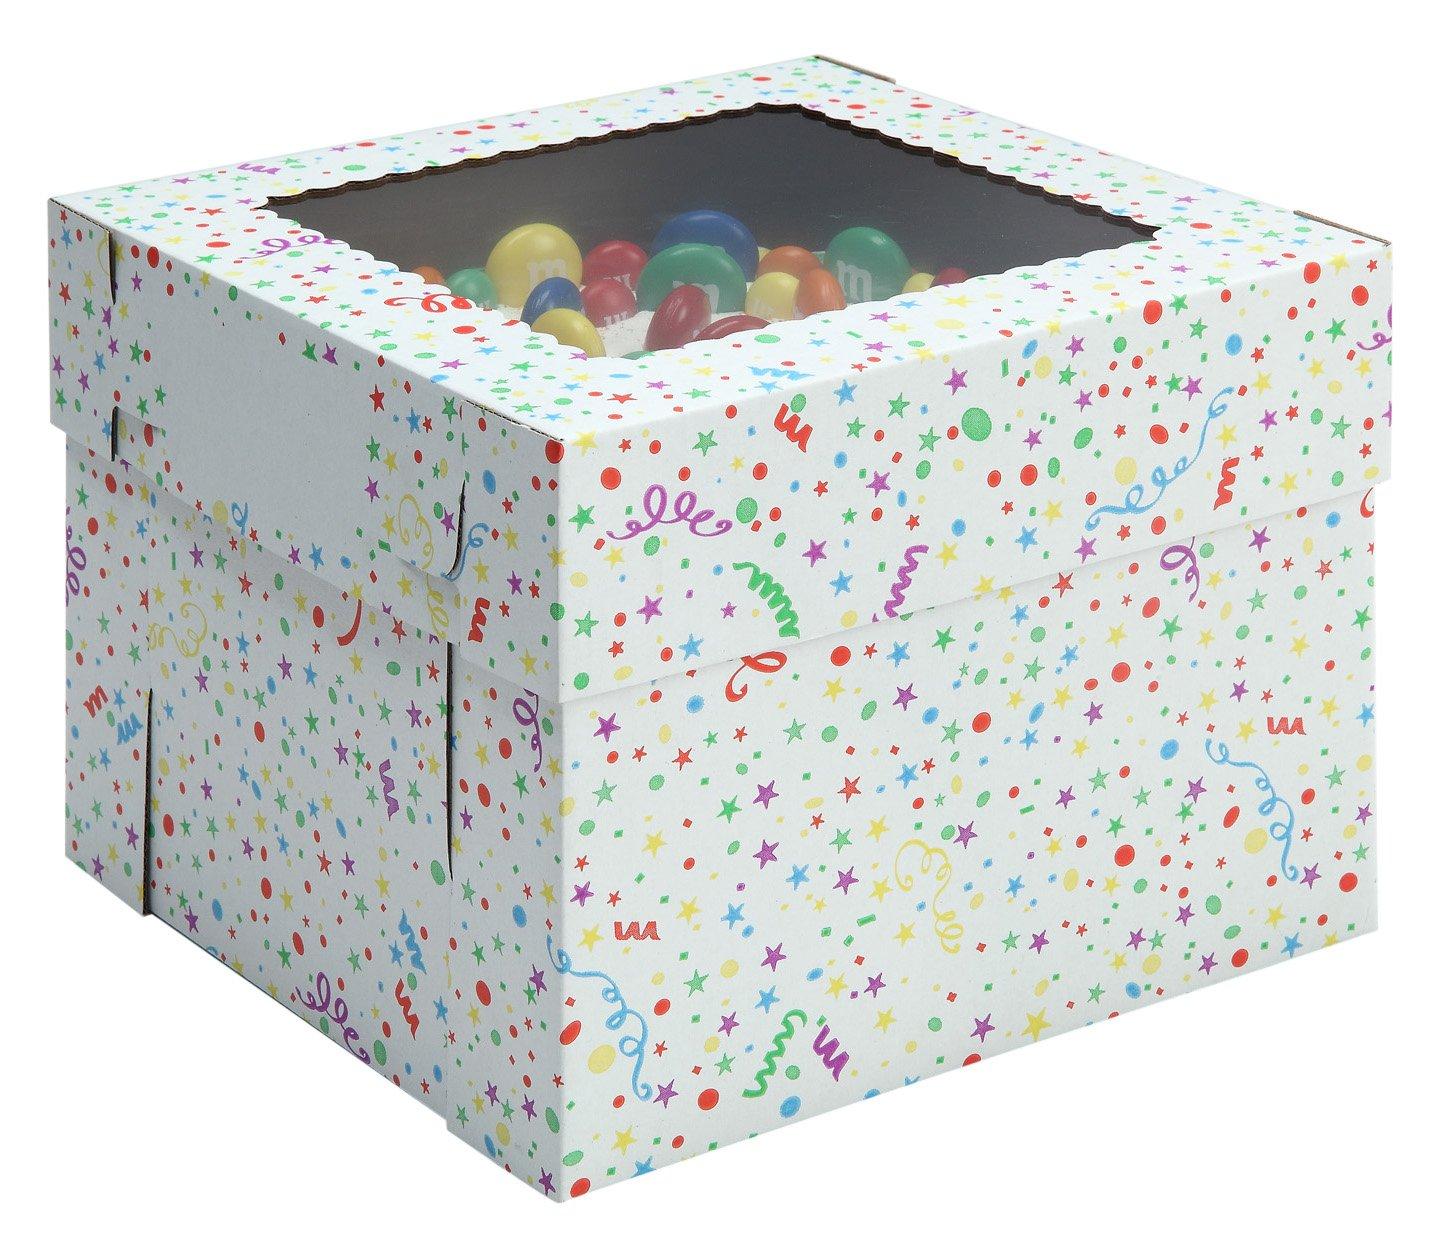 W PACKAGING WPCKB108PB 10x10x8 White/Kraft Party Print 8'' Deep Cake Box W/Window, E-Flute (Pack of 25)